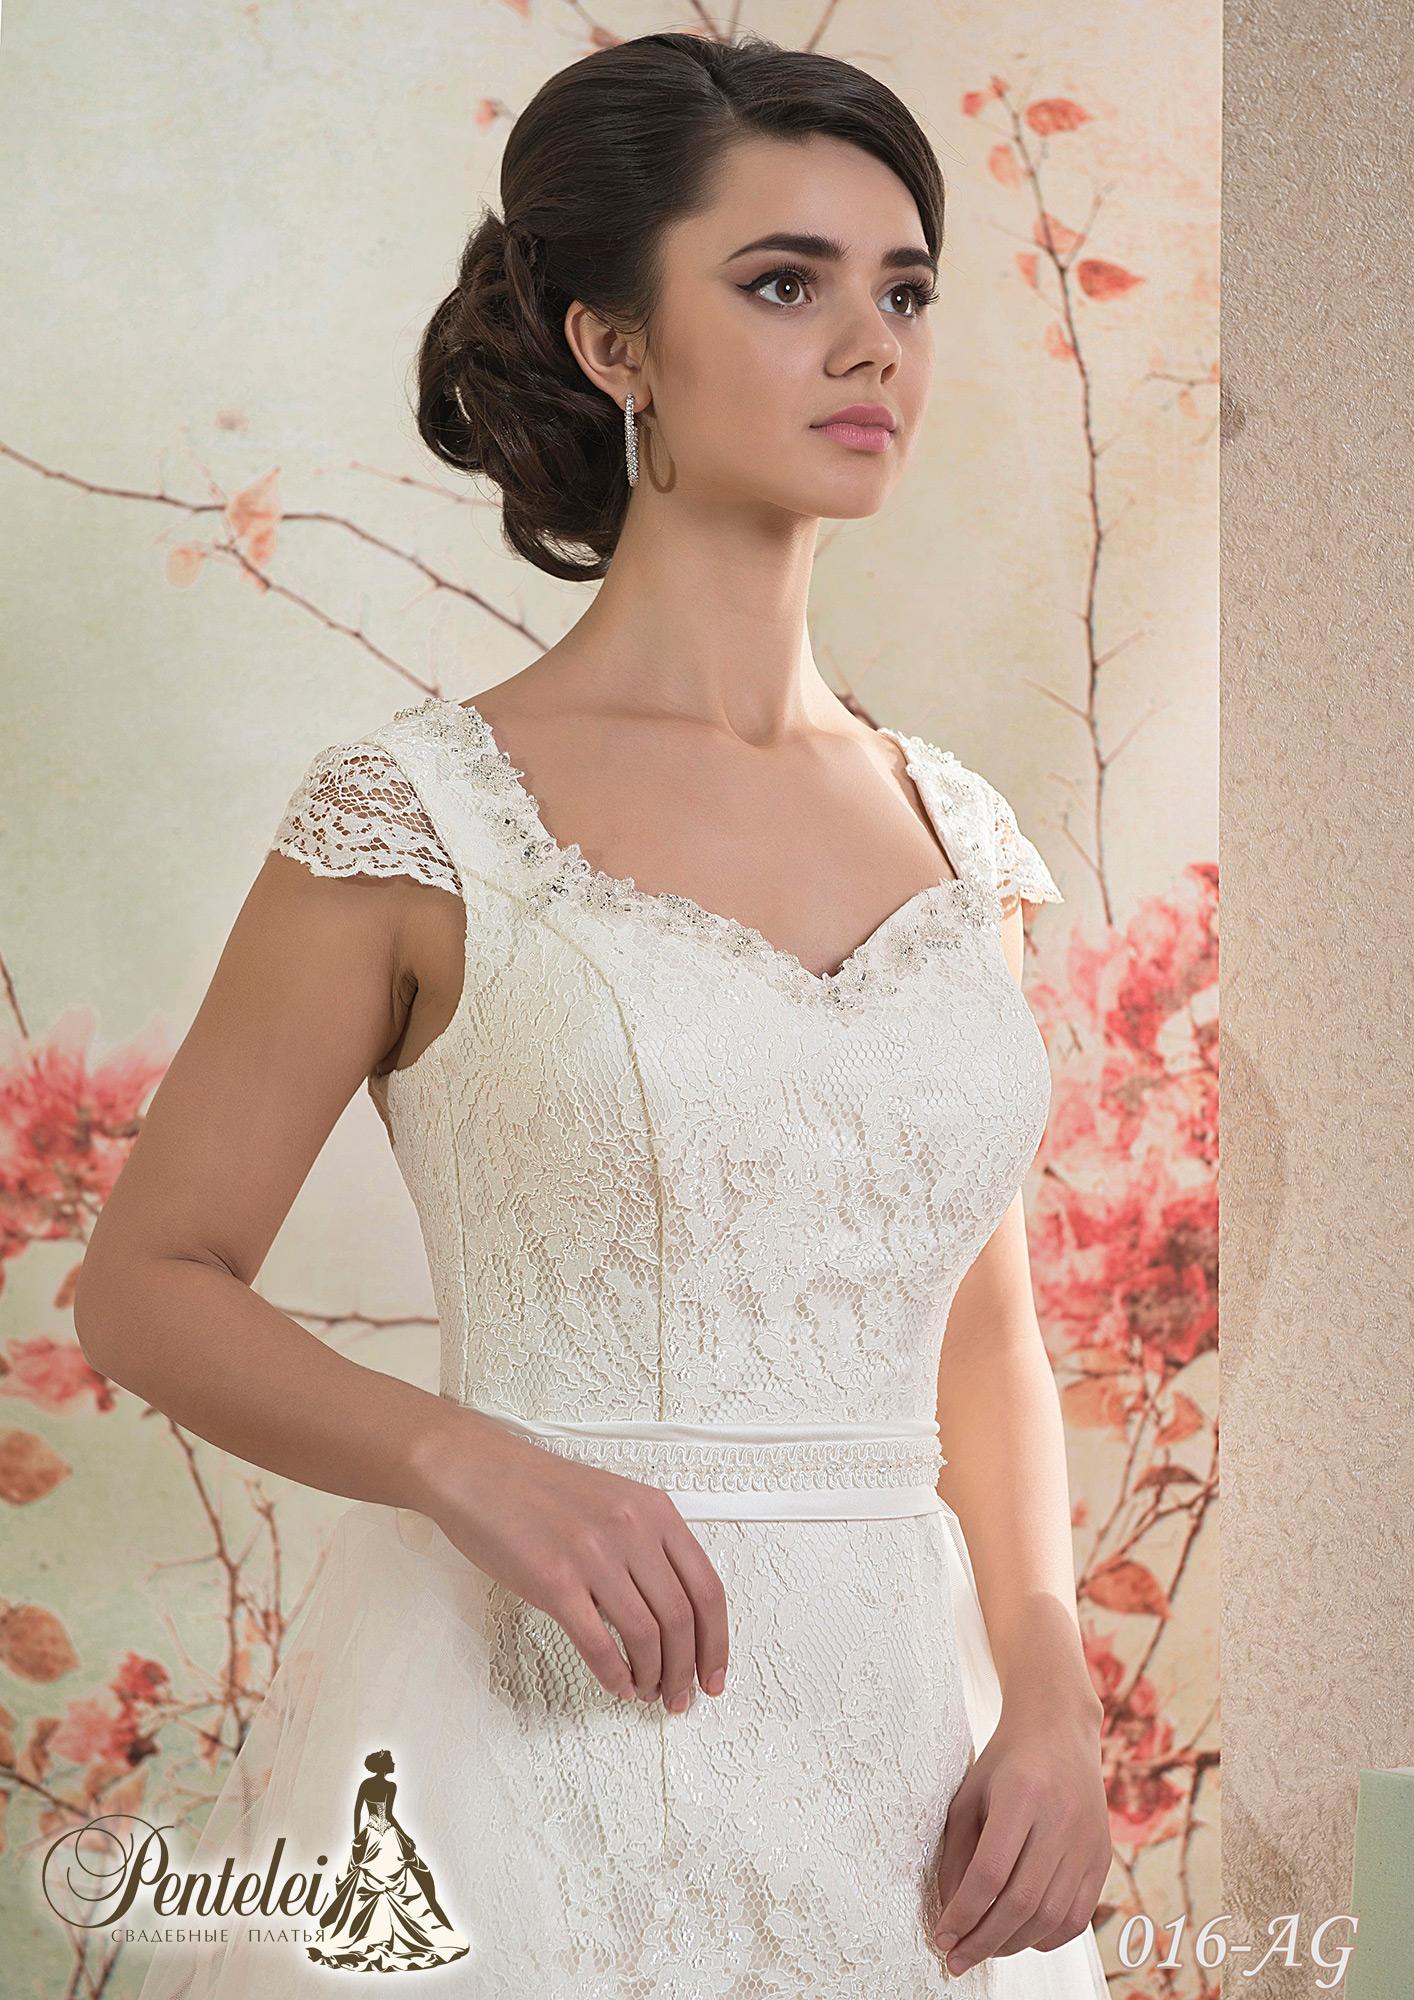 016-AG | Cumpăra rochii de mireasă en-gros de Pentelei